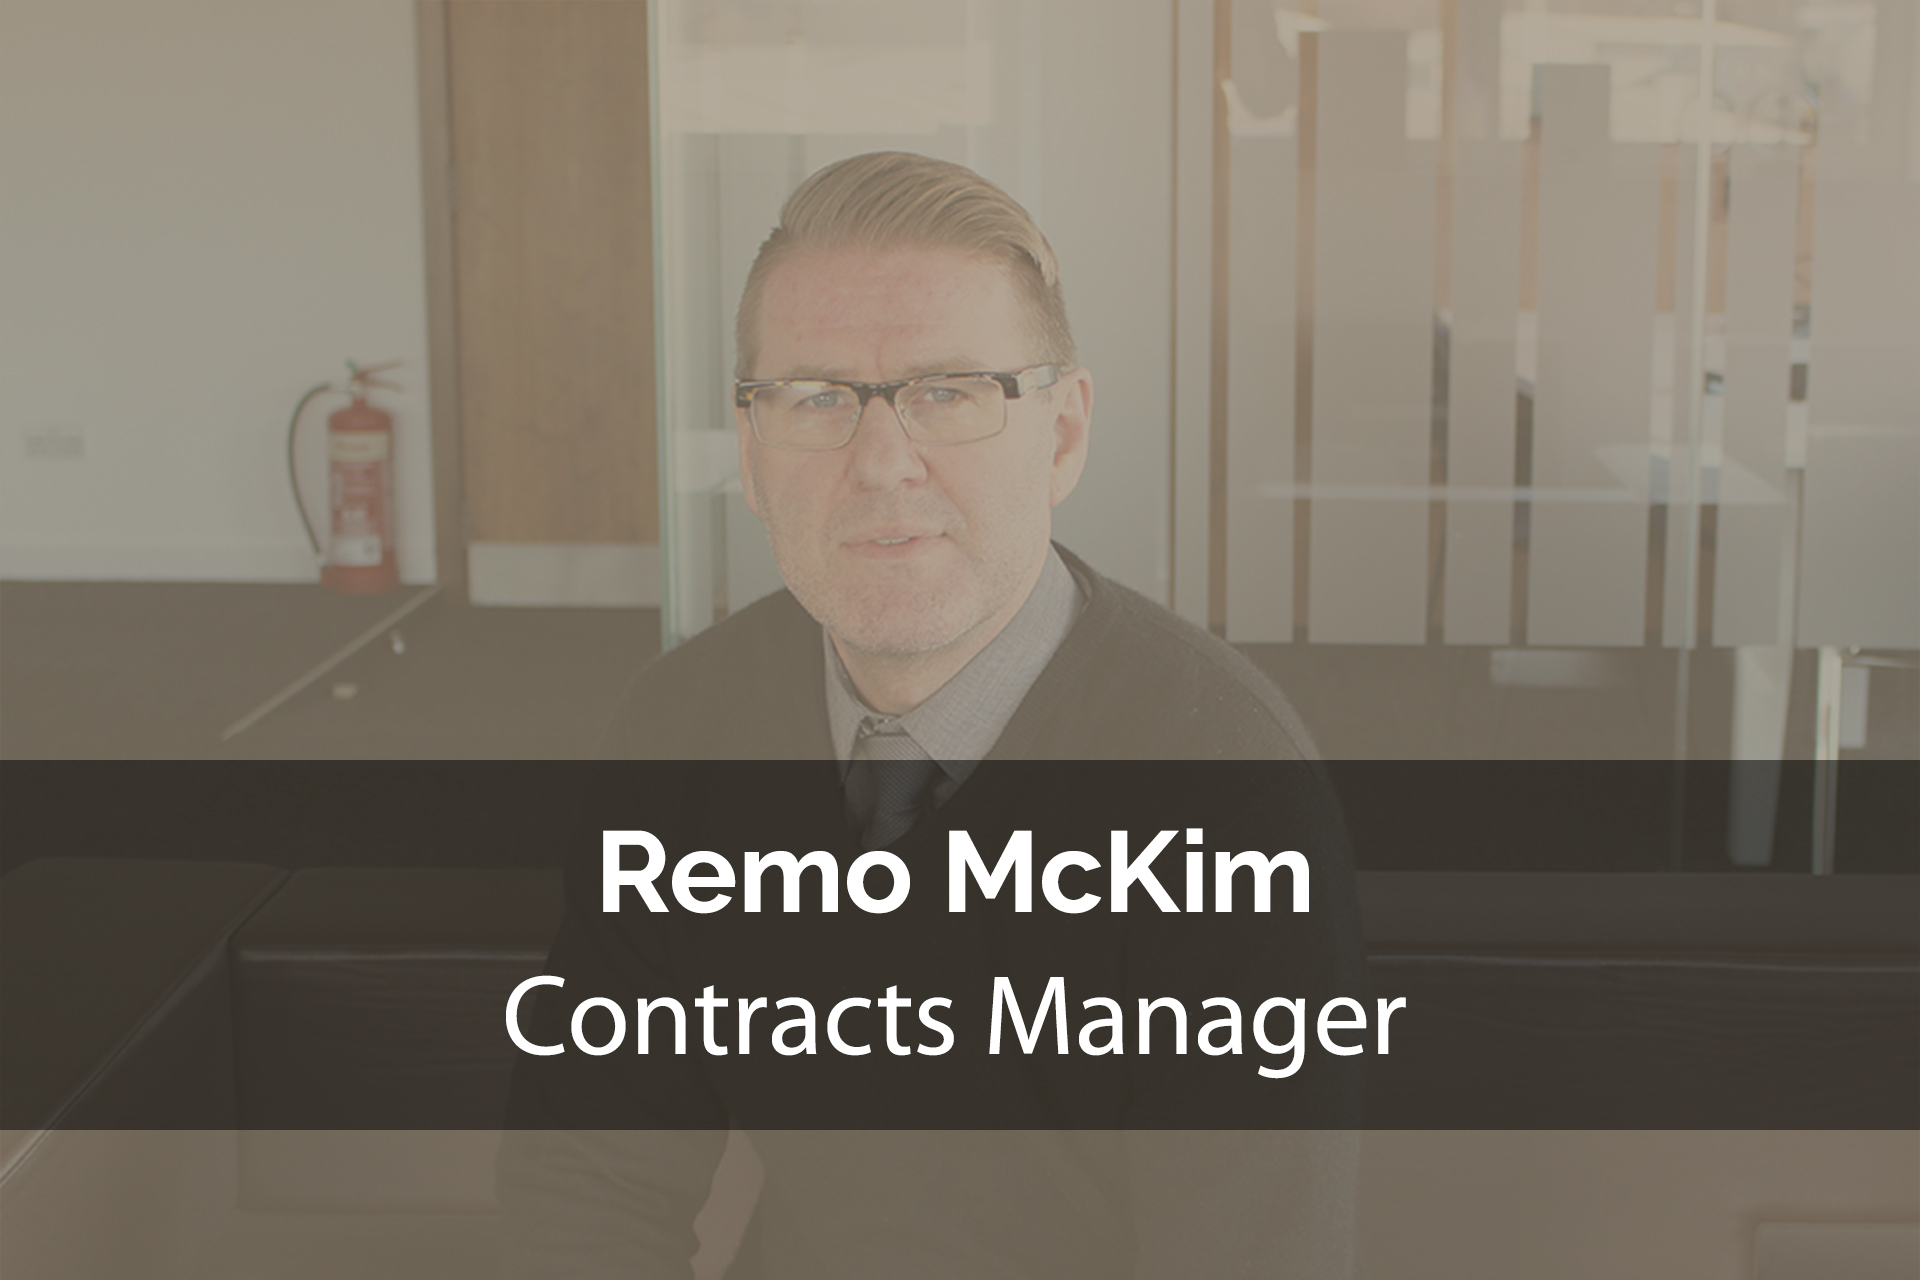 Remo McKim